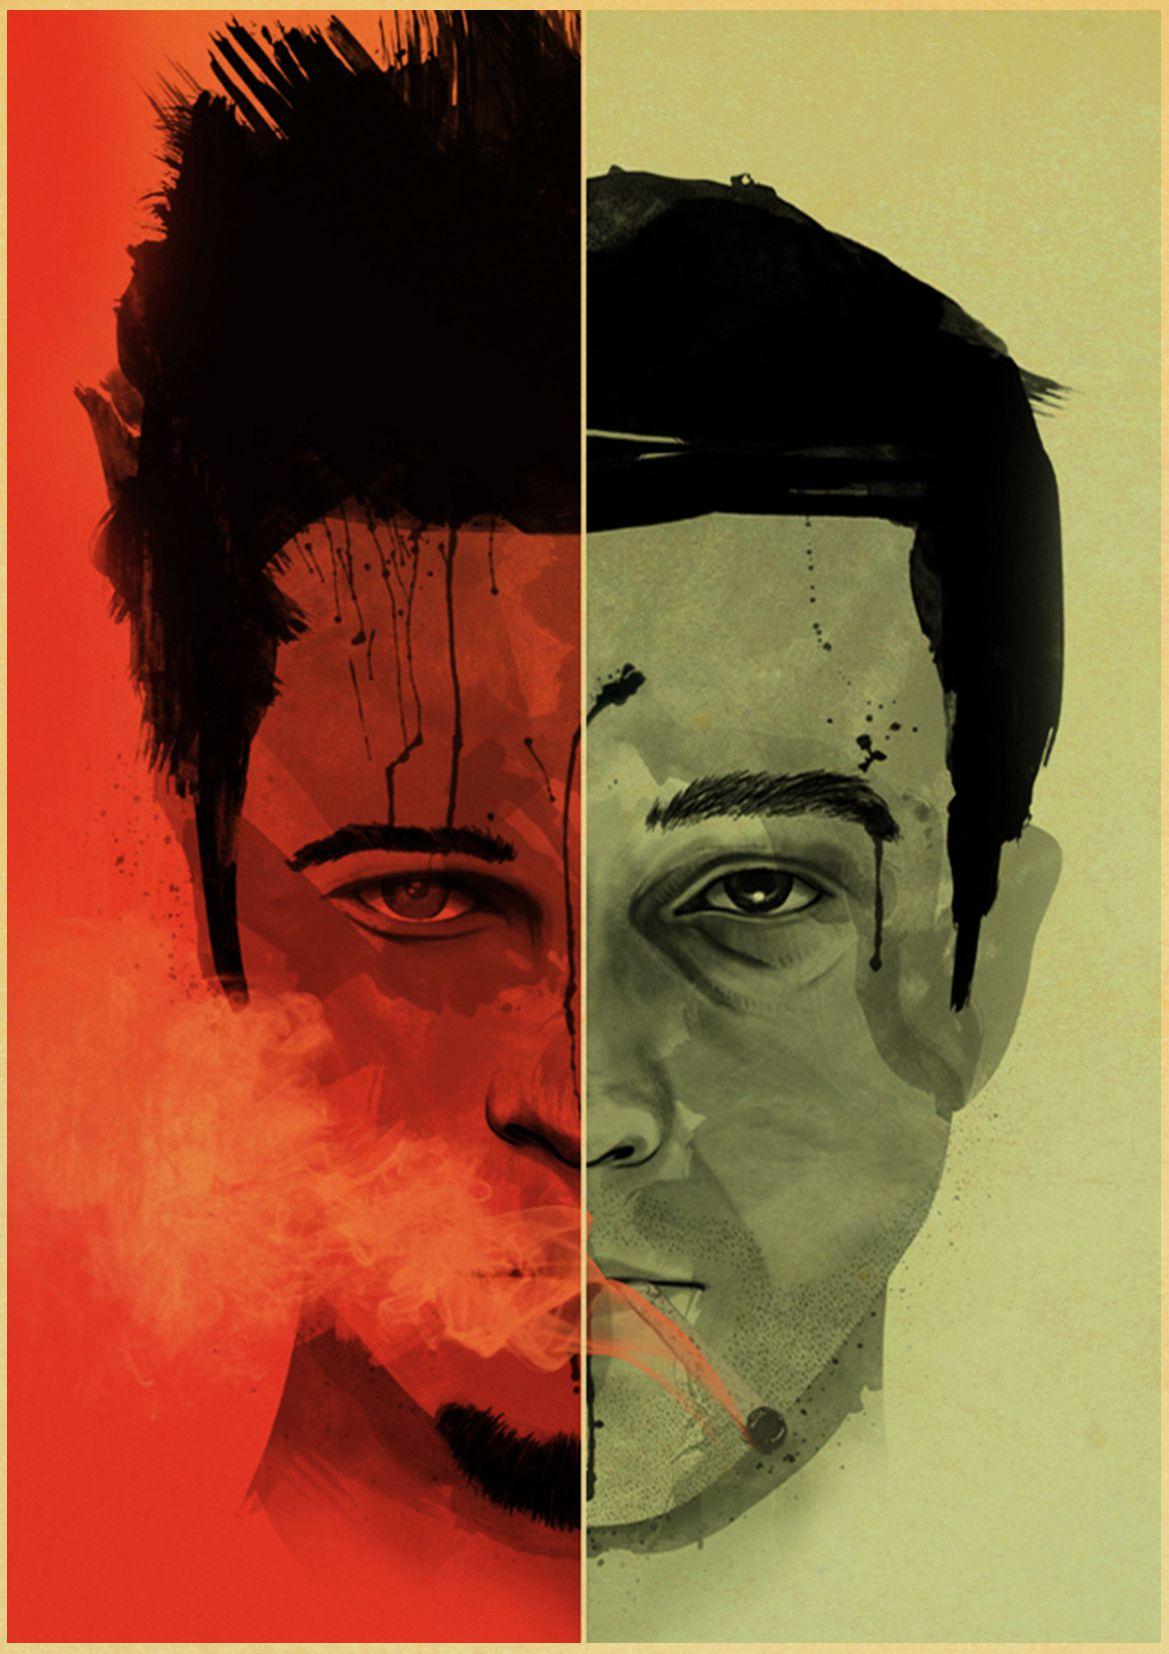 HTB1Fdr5MsfpK1RjSZFOq6y6nFXaZ Vintage Poster classic movie Pulp Fiction / Kill Bill/Fight Club poster Retro kraft paper posters decorative art painting